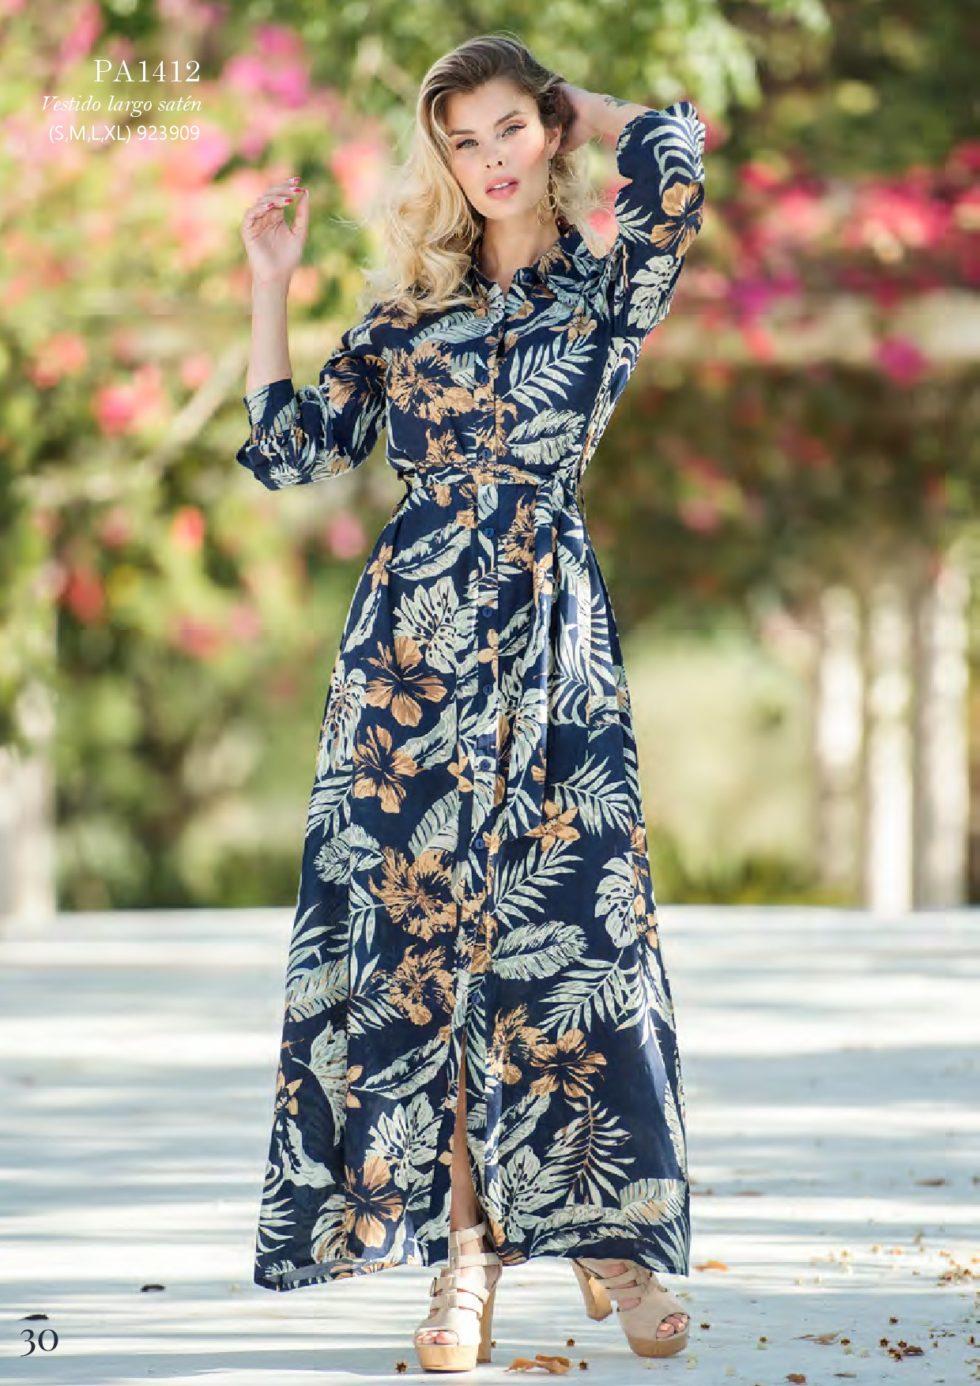 Flamenco Rosa Otoño 2021 MOD1-032